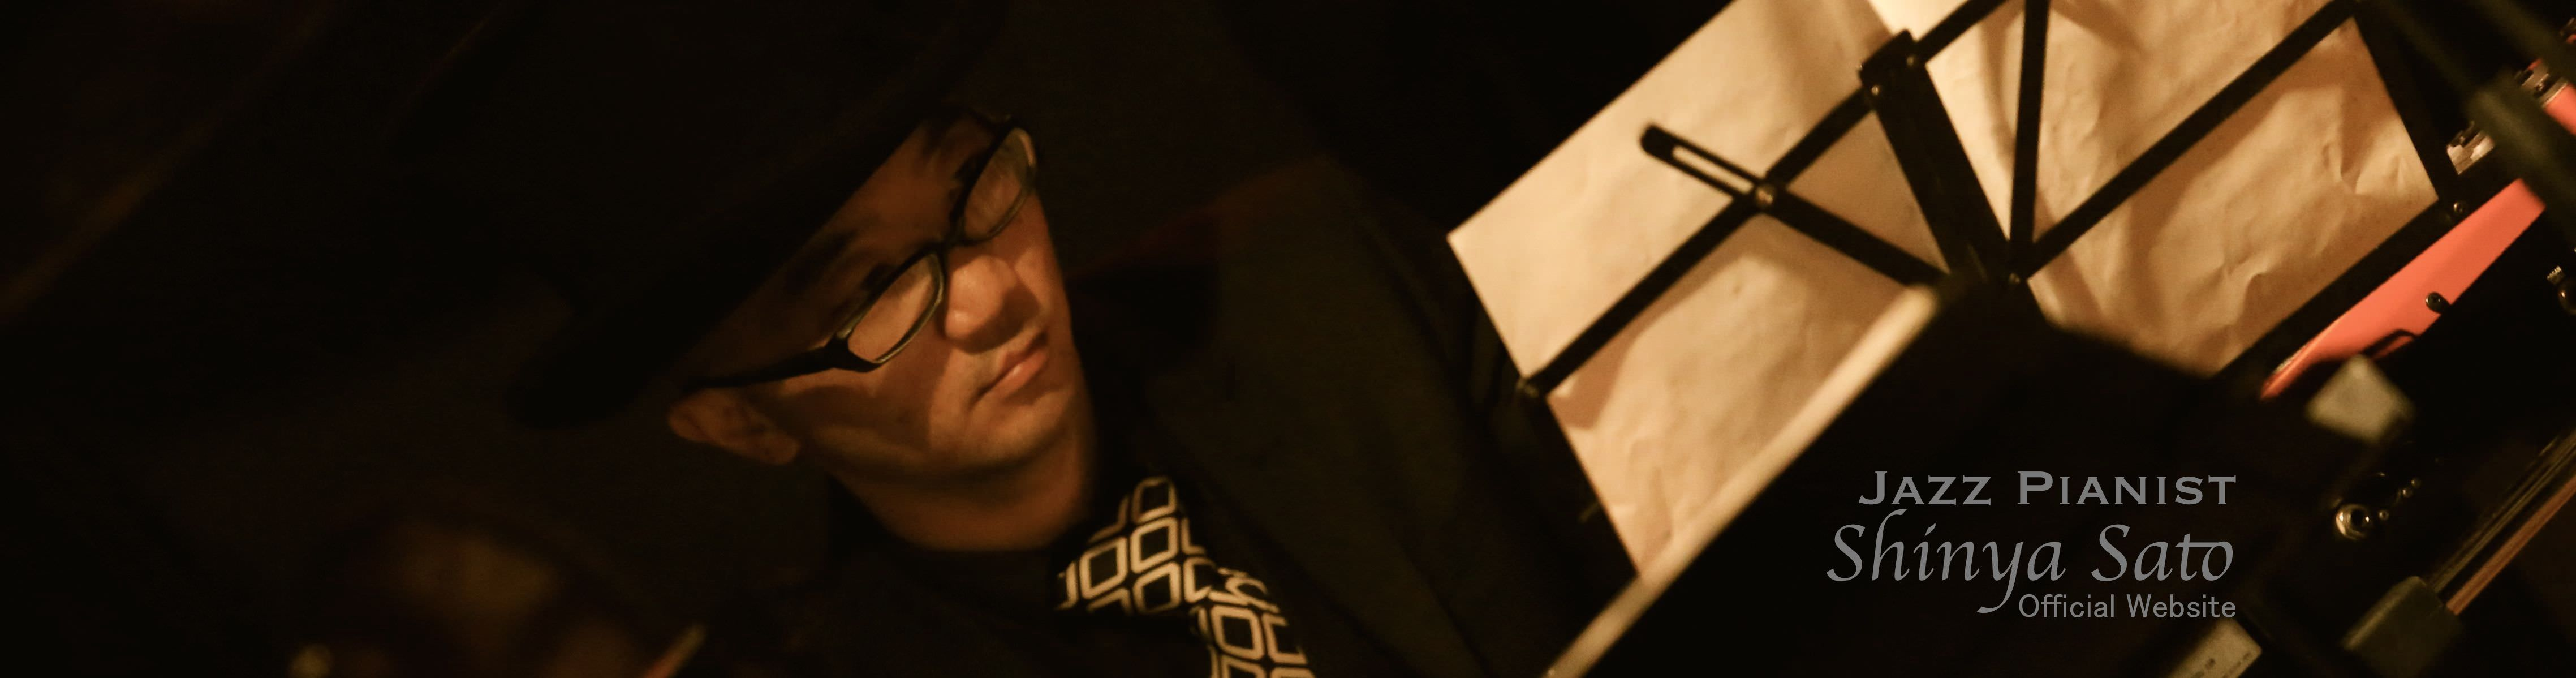 Jazz Pianist 佐藤真也 ジャズピアノ教室